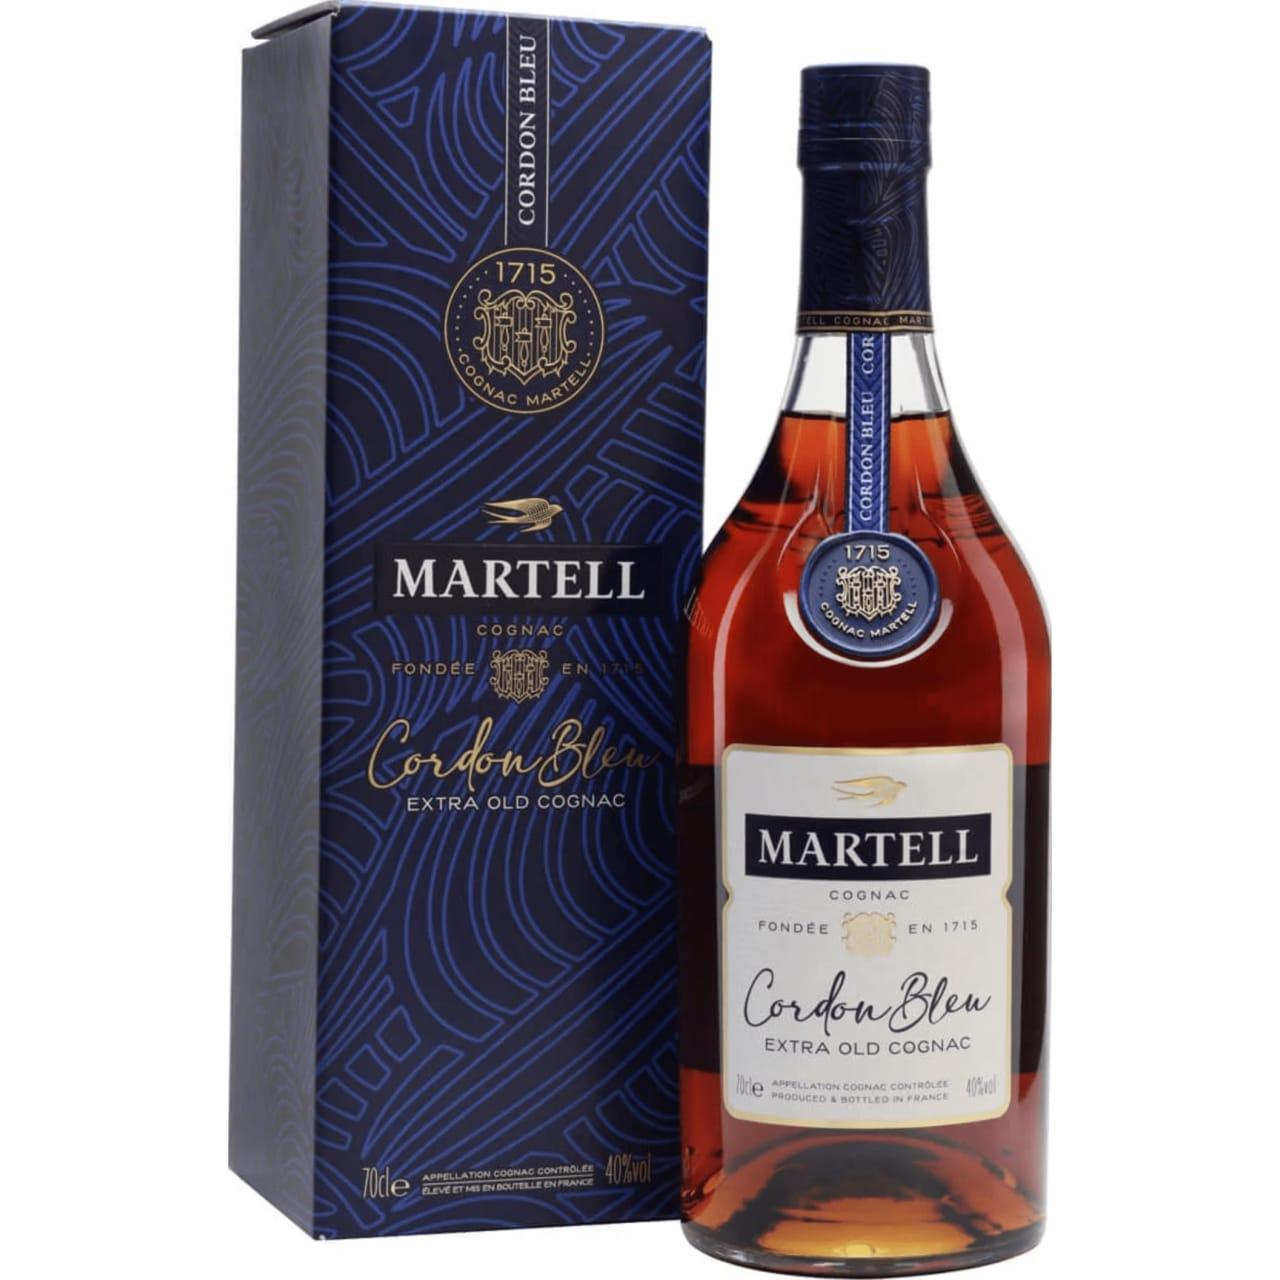 Product Image - Martell Cordon Bleu Cognac